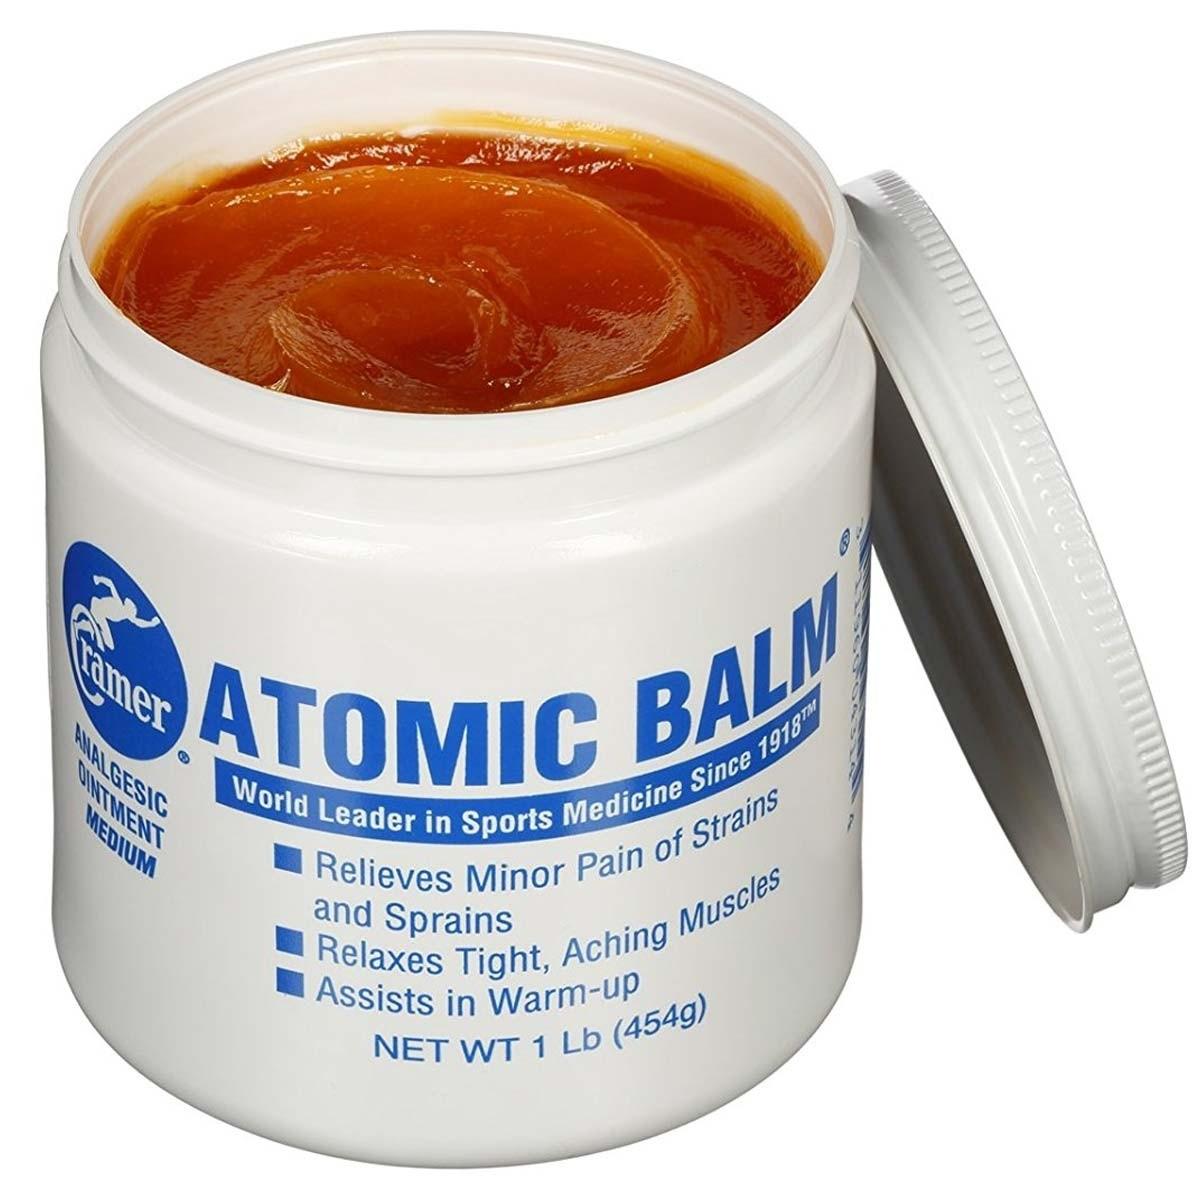 Cramer Atomic Balm Analgesic Ointment 1lb Jar A73 100